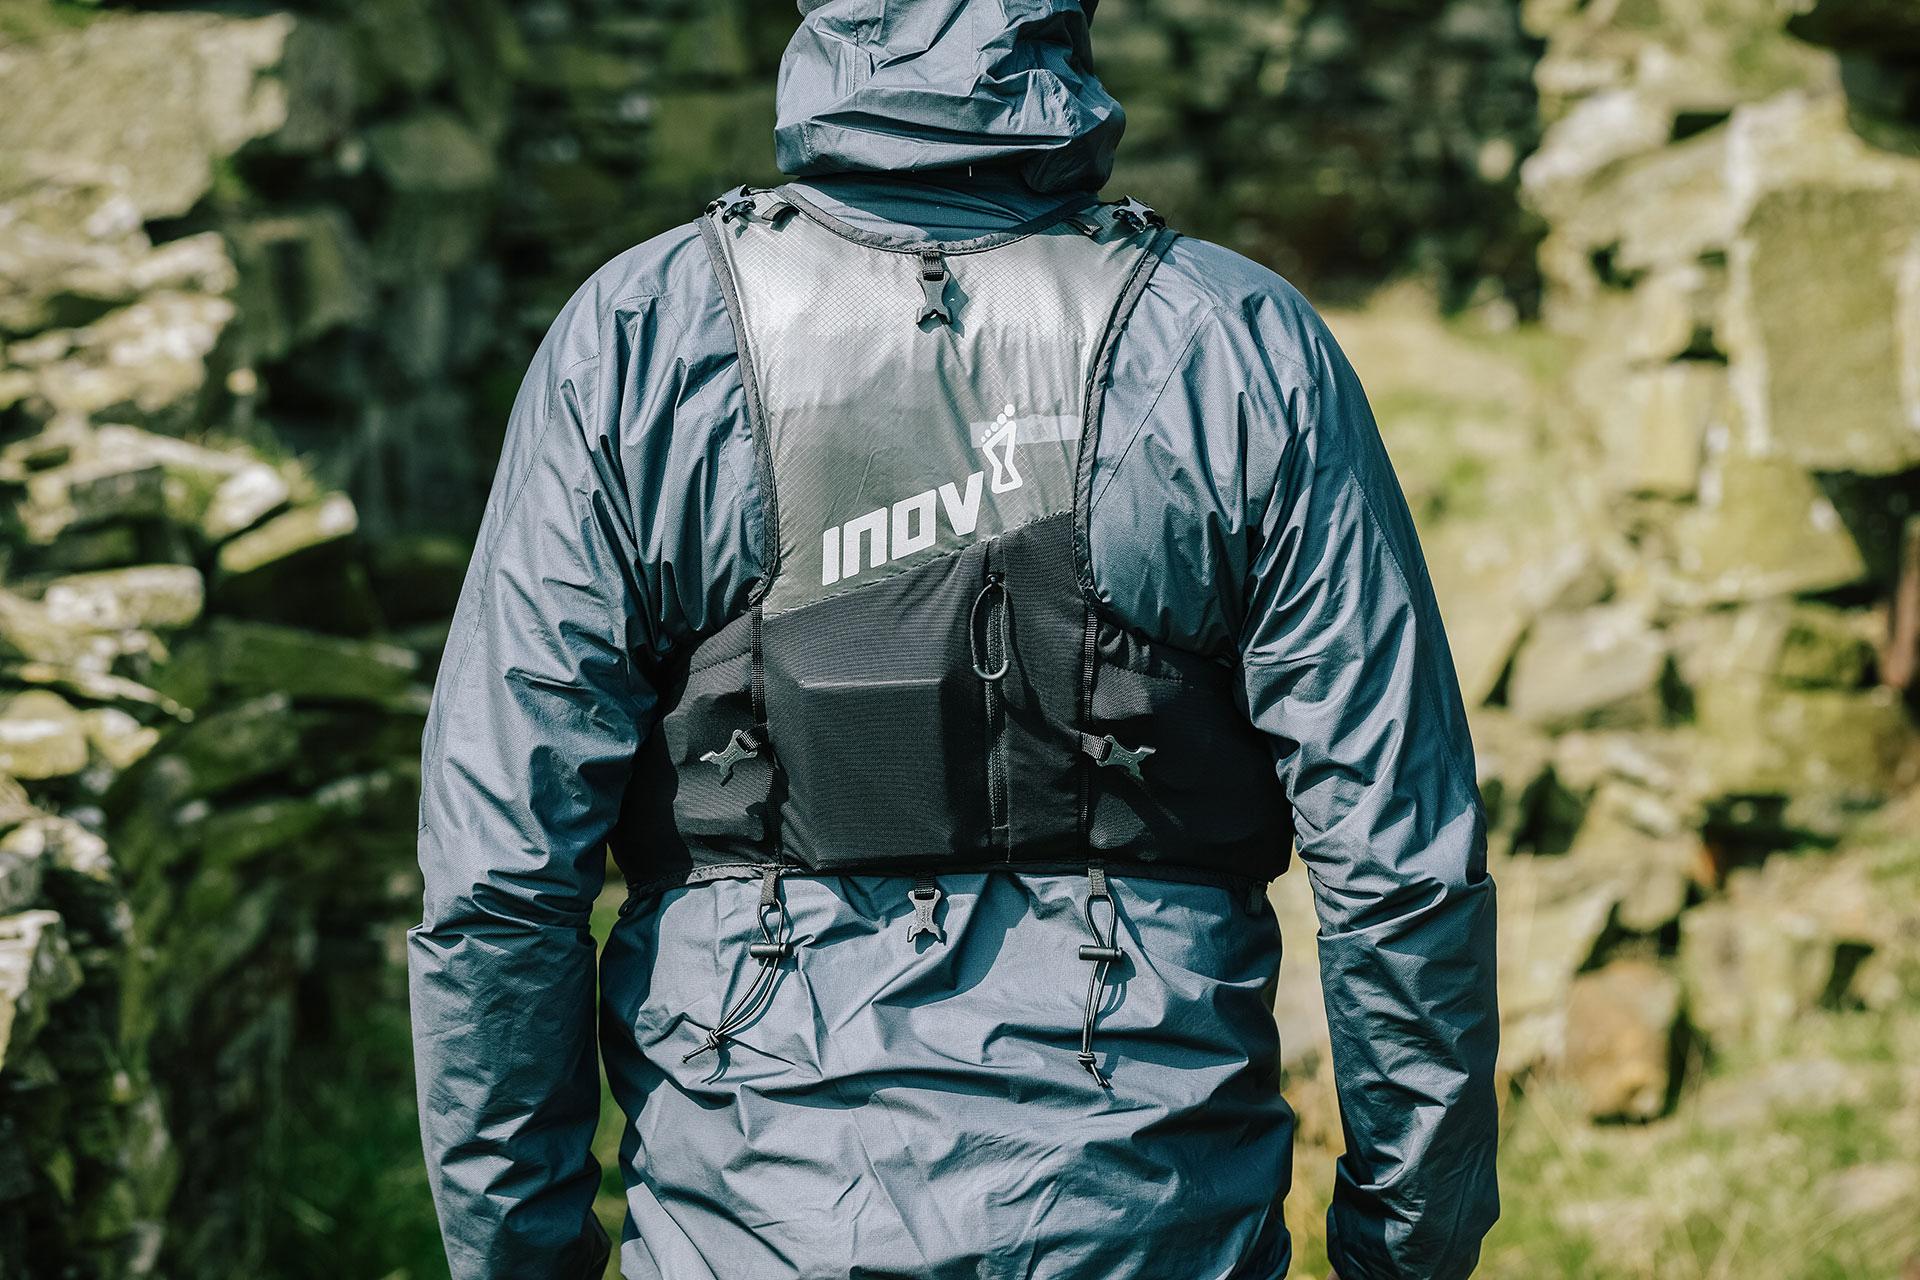 Inov8 All Terrain Pro Vest Black